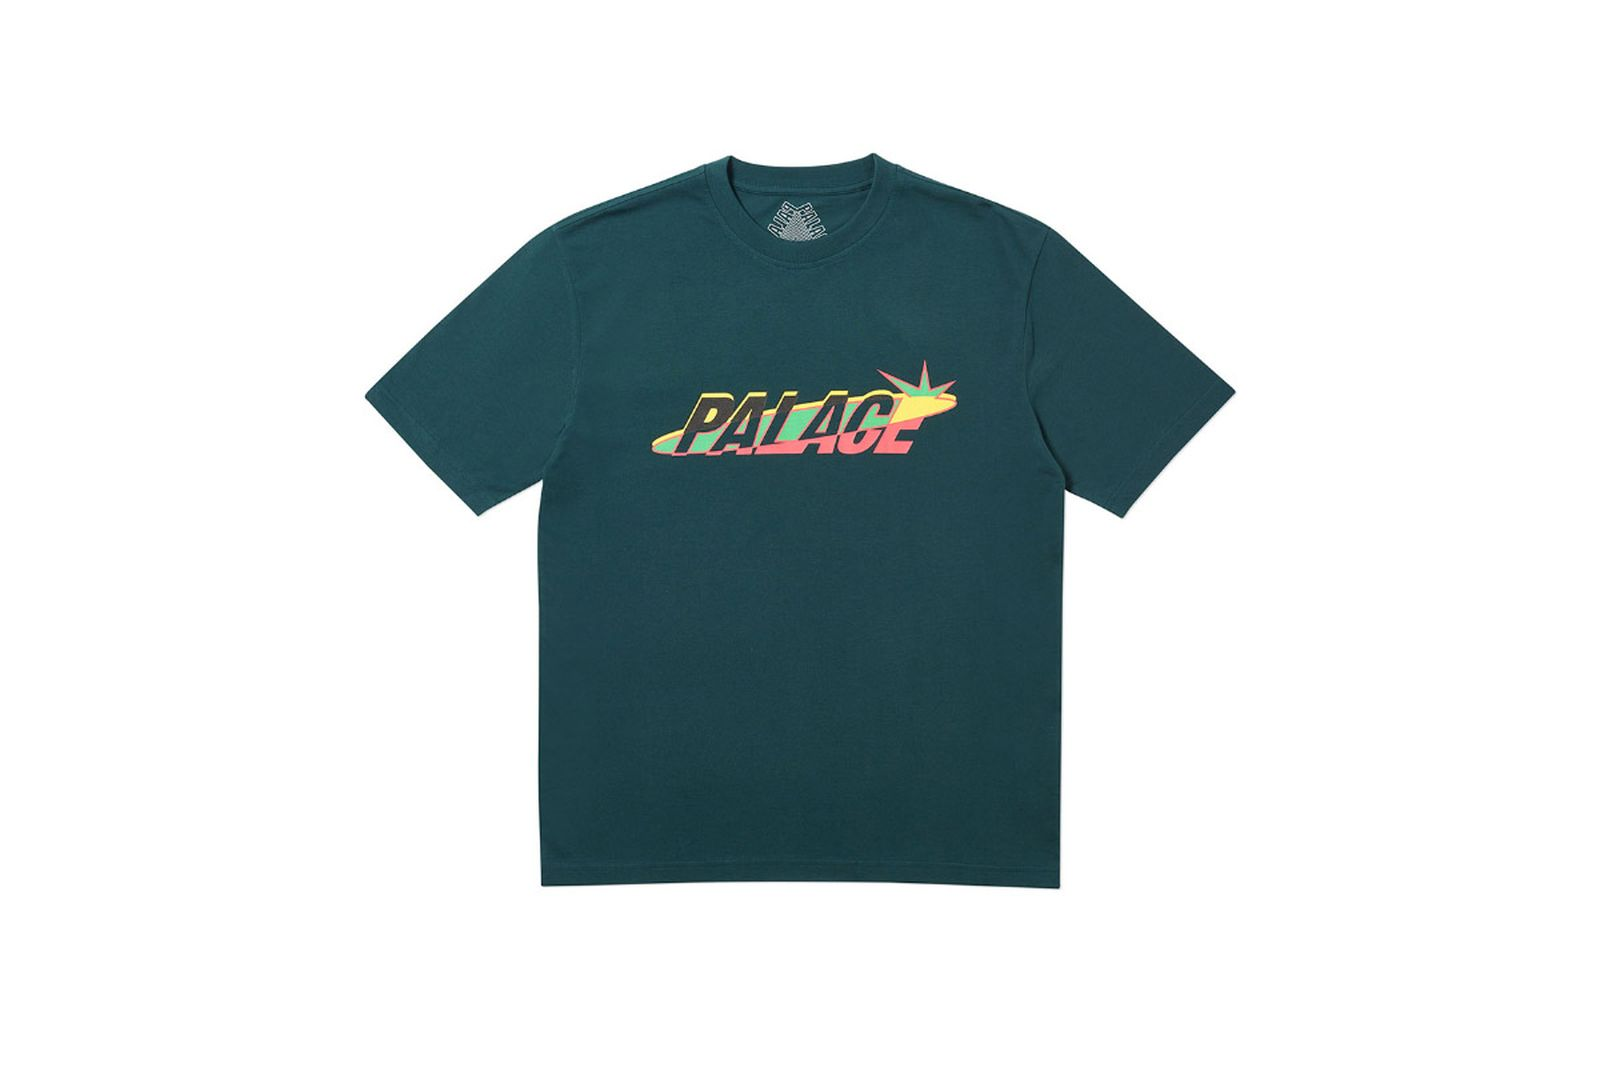 Palace 2019 Autumn T Shirt Lique green